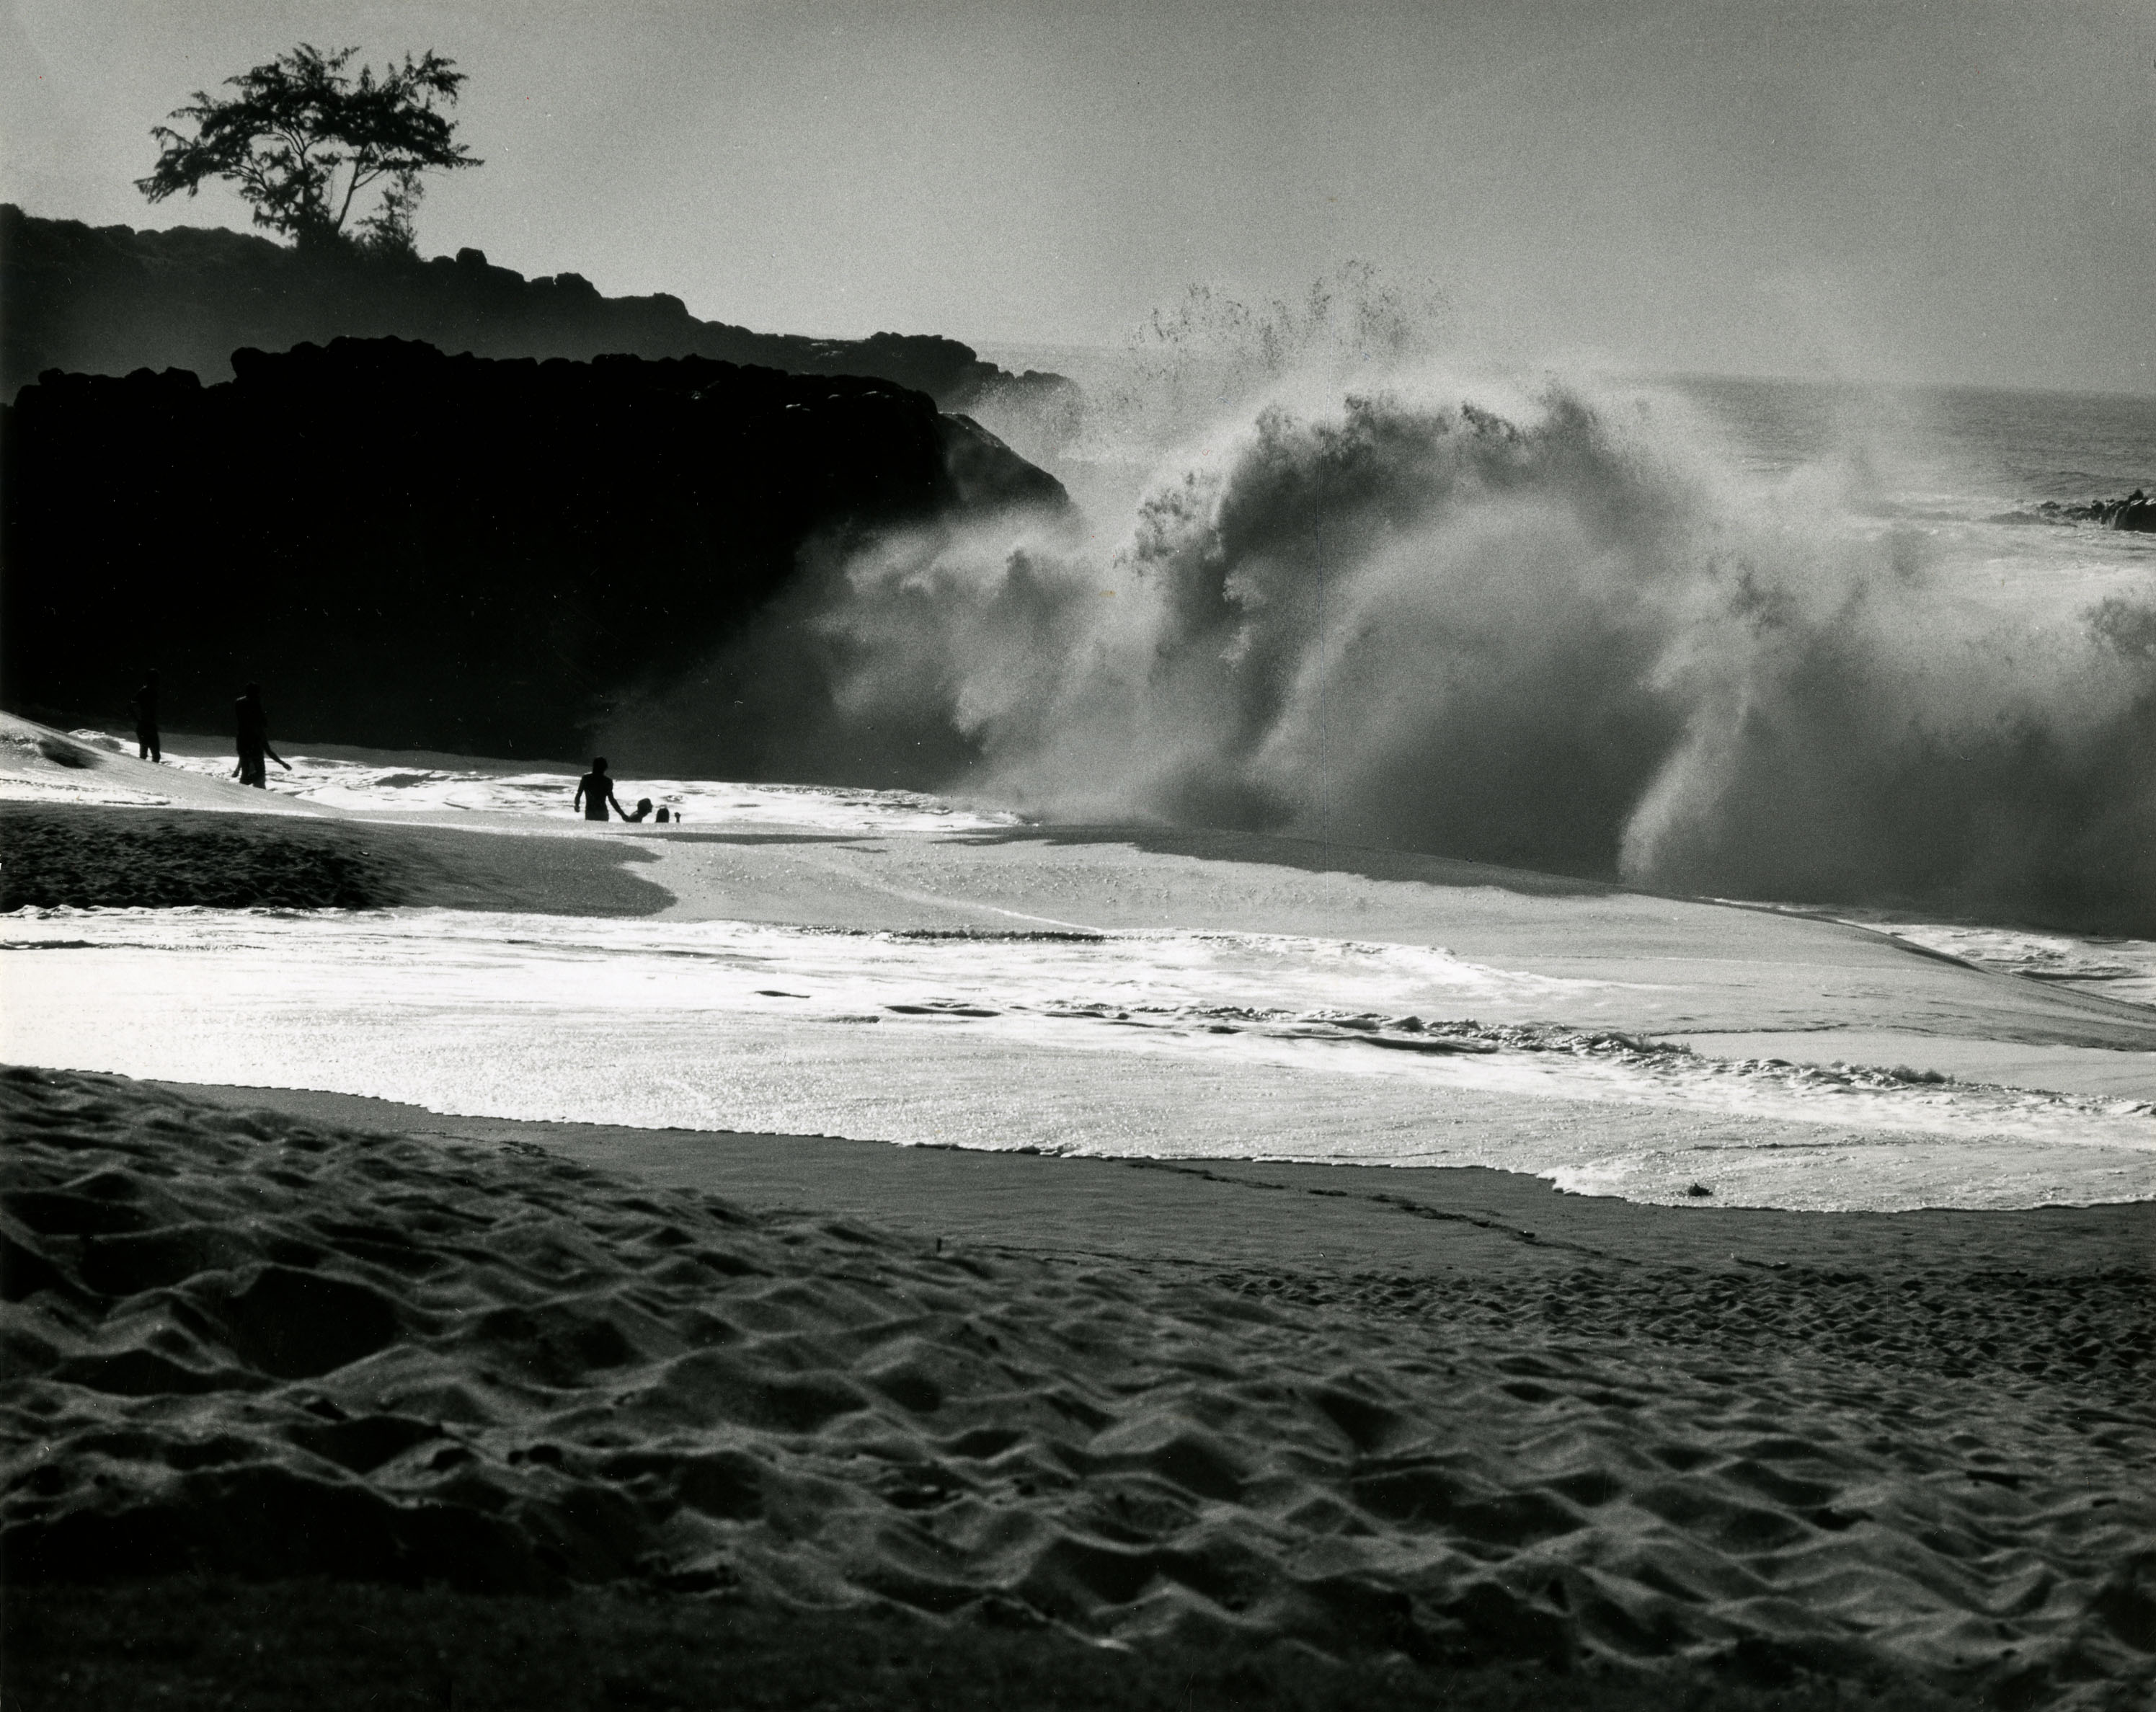 Fotó: Haár Ferenc: Haragszik a tenger, (Hawaii), 1960 © Magyar Fotográfiai Múzeum